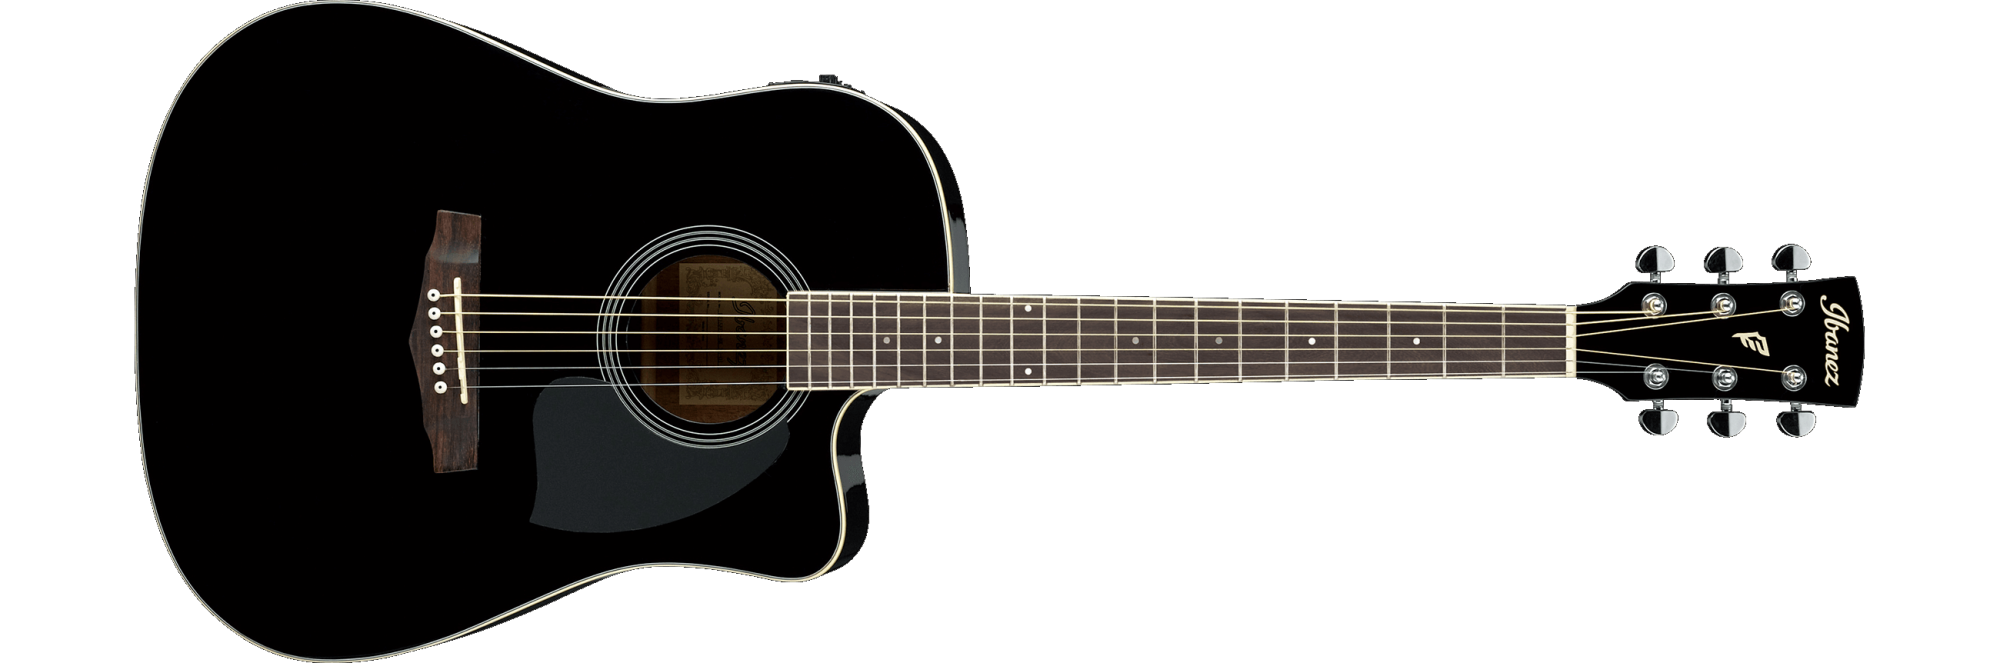 Ibanez PF15ECEBK Acoustic Black